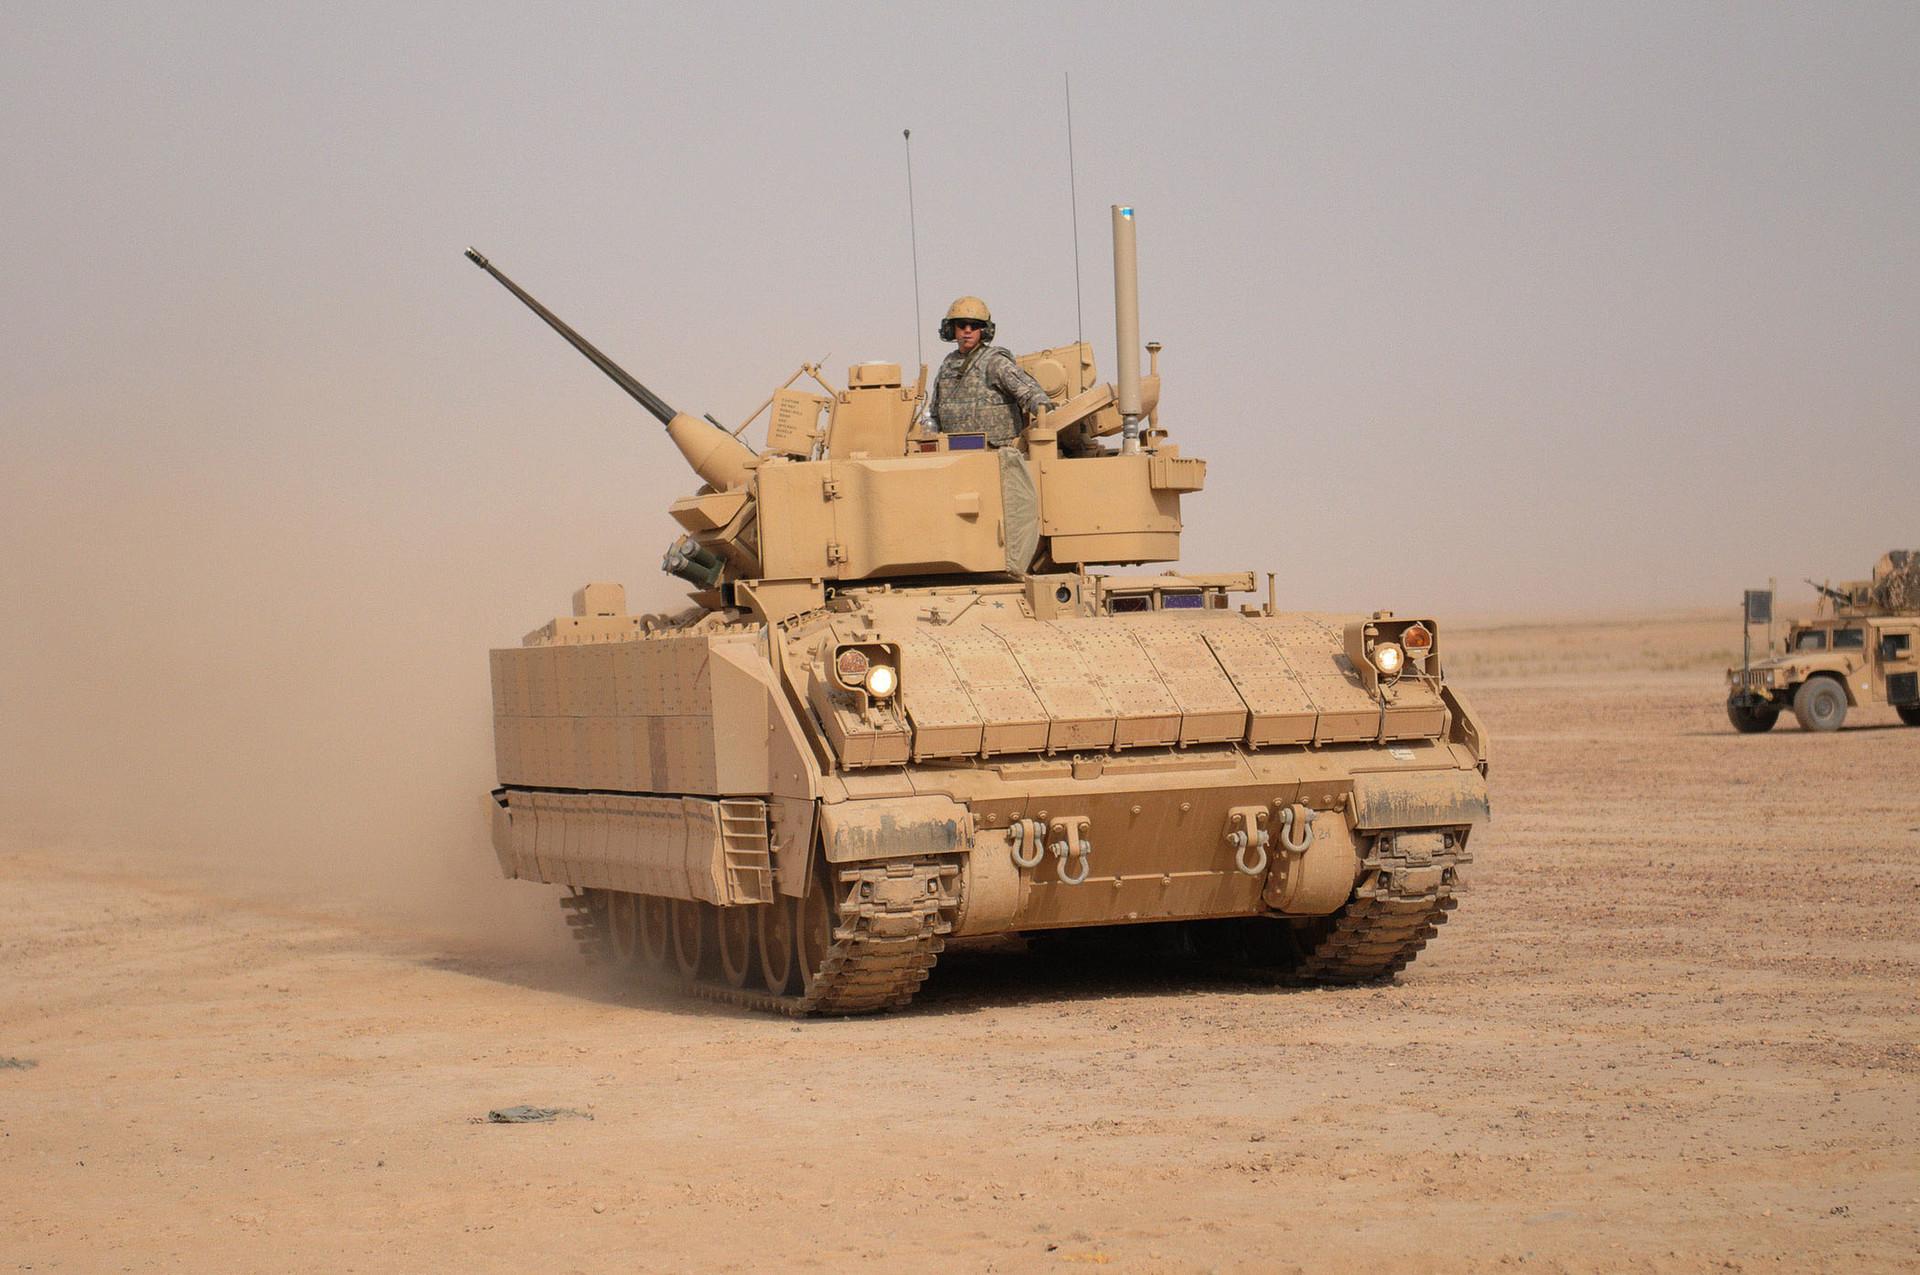 M2A3 Bradley опремљен динамичком оклопном заштитом